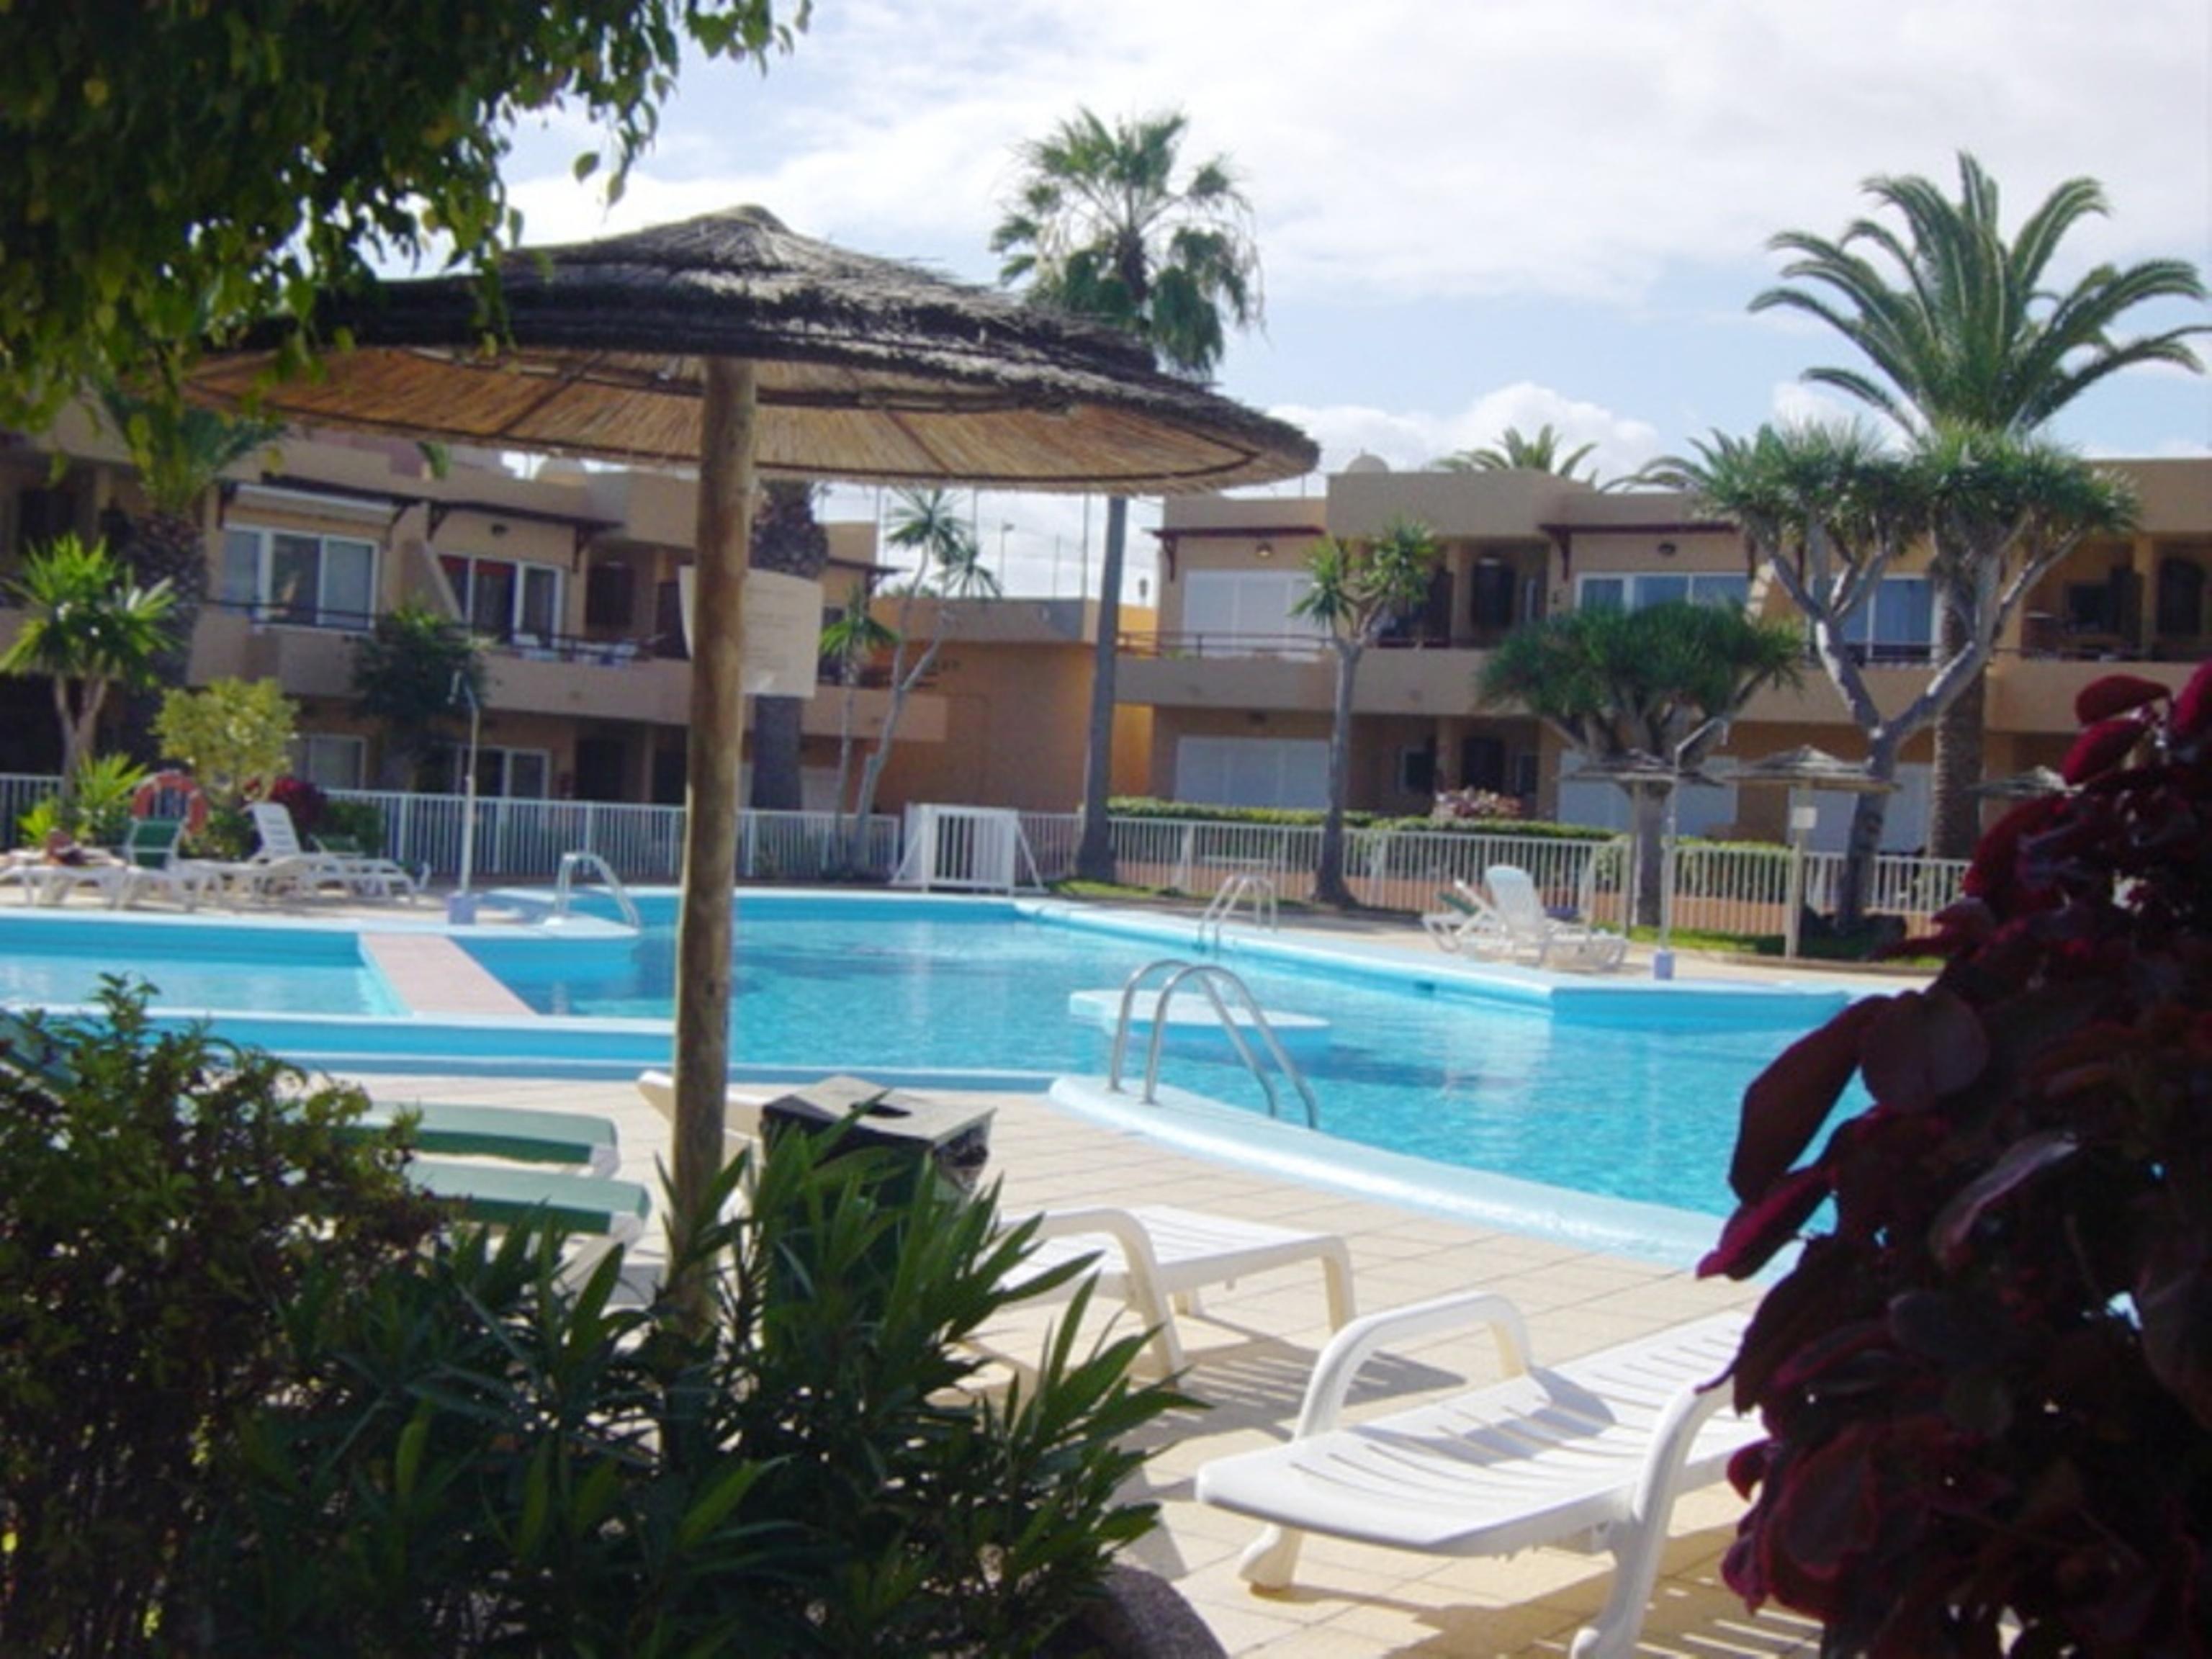 Ferienwohnung Wohnung El Mirador -Residencial Las Dunas - (2196686), Corralejo, Fuerteventura, Kanarische Inseln, Spanien, Bild 13